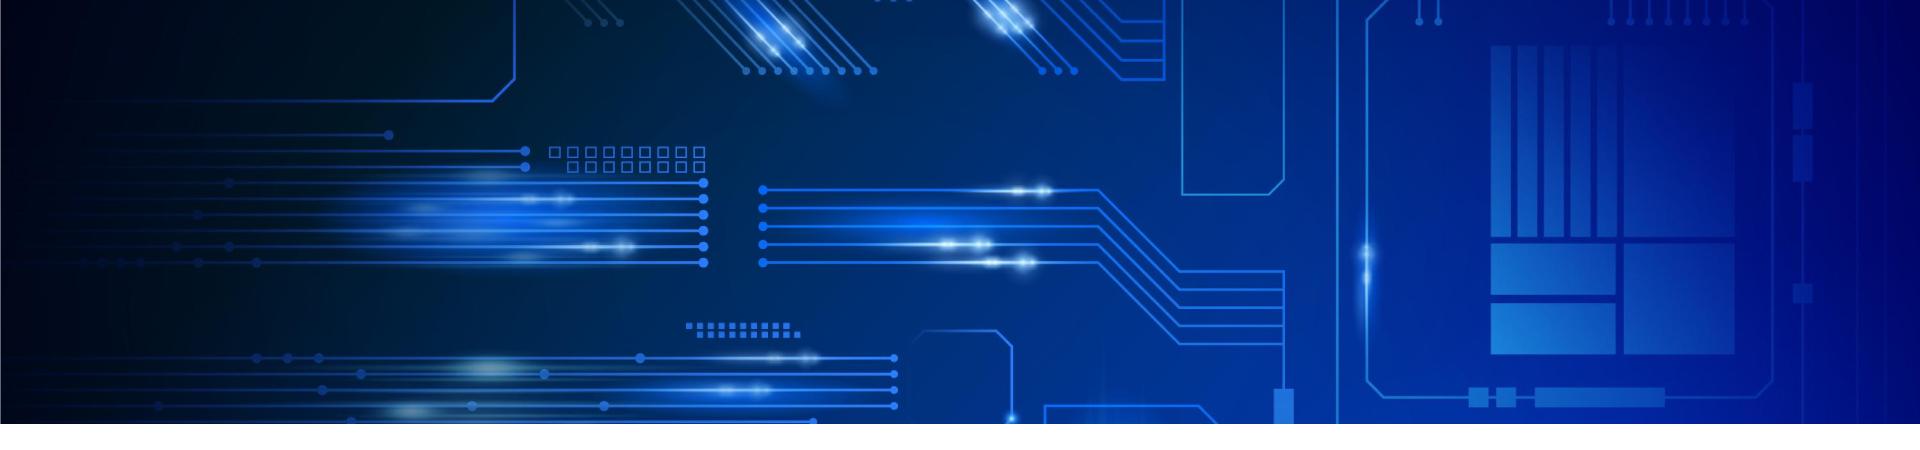 promwad FPGA Intel services